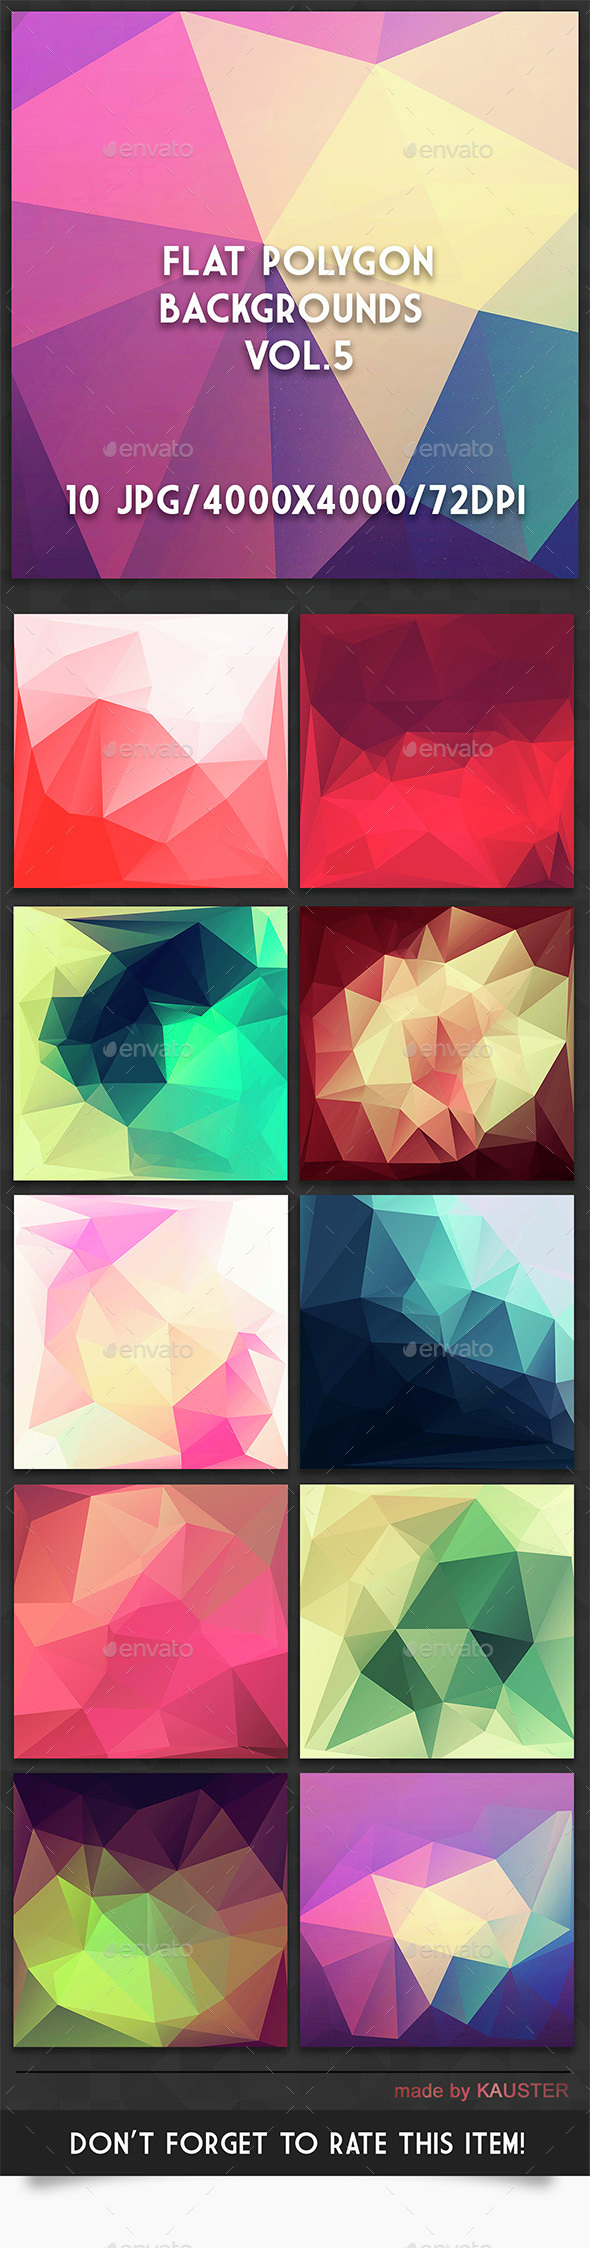 Flat Polygon Backgrounds Vol.5